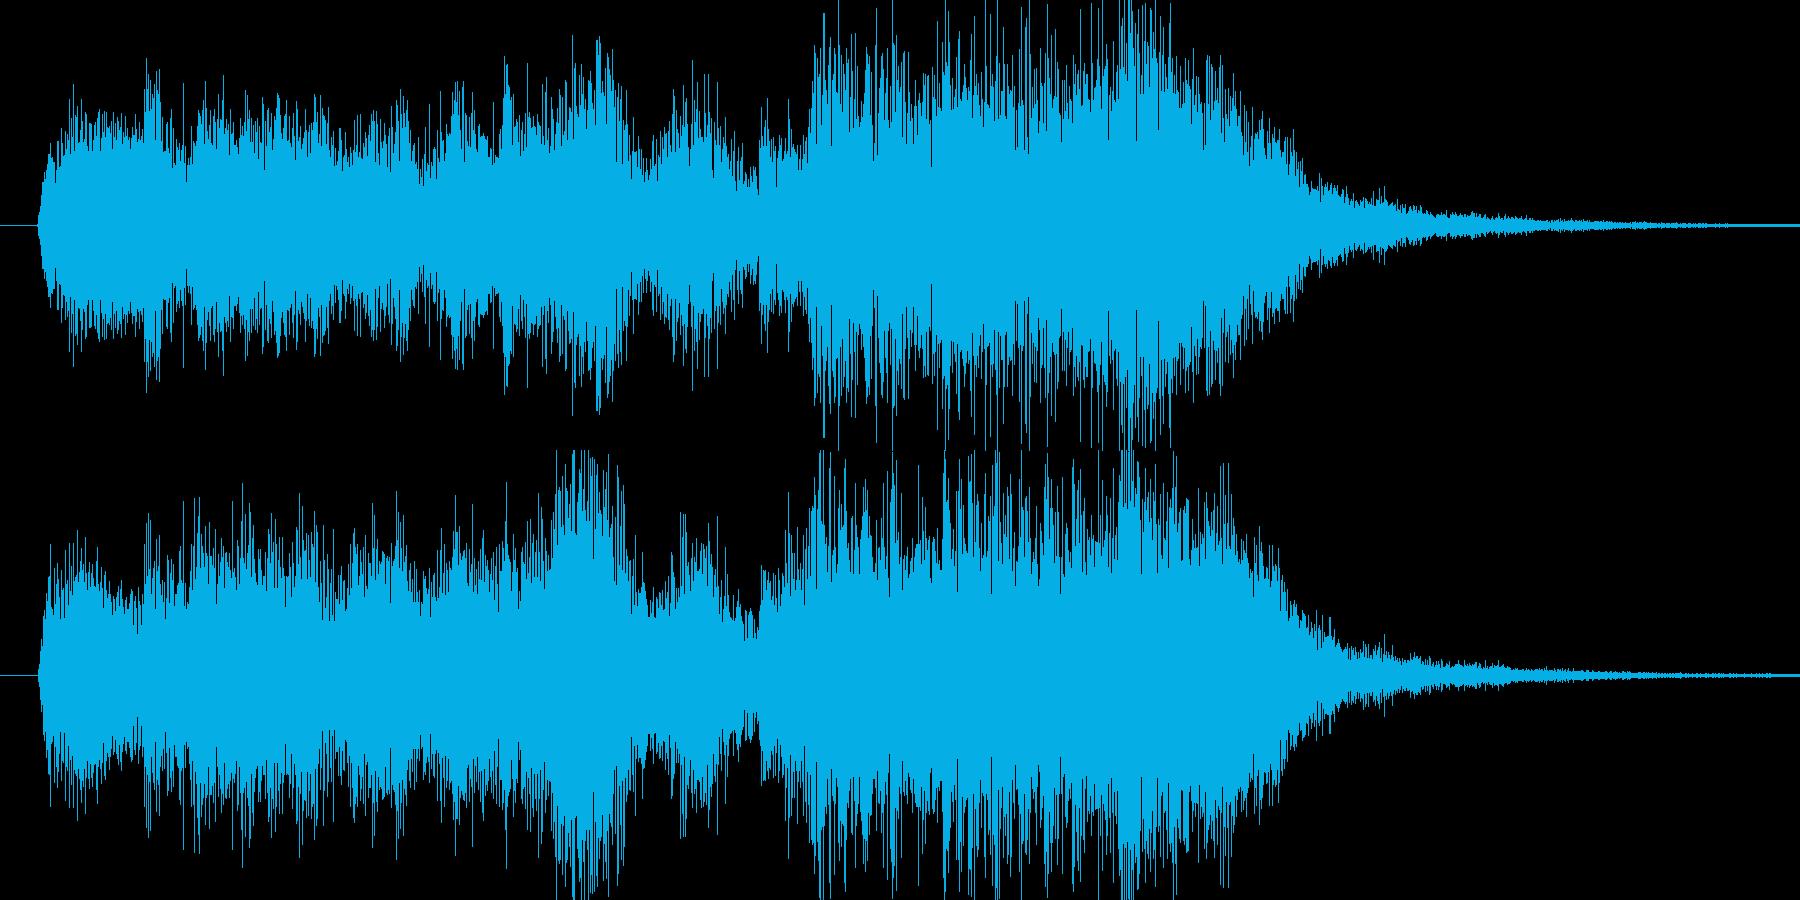 RPGの戦闘勝利風のファンファーレの再生済みの波形